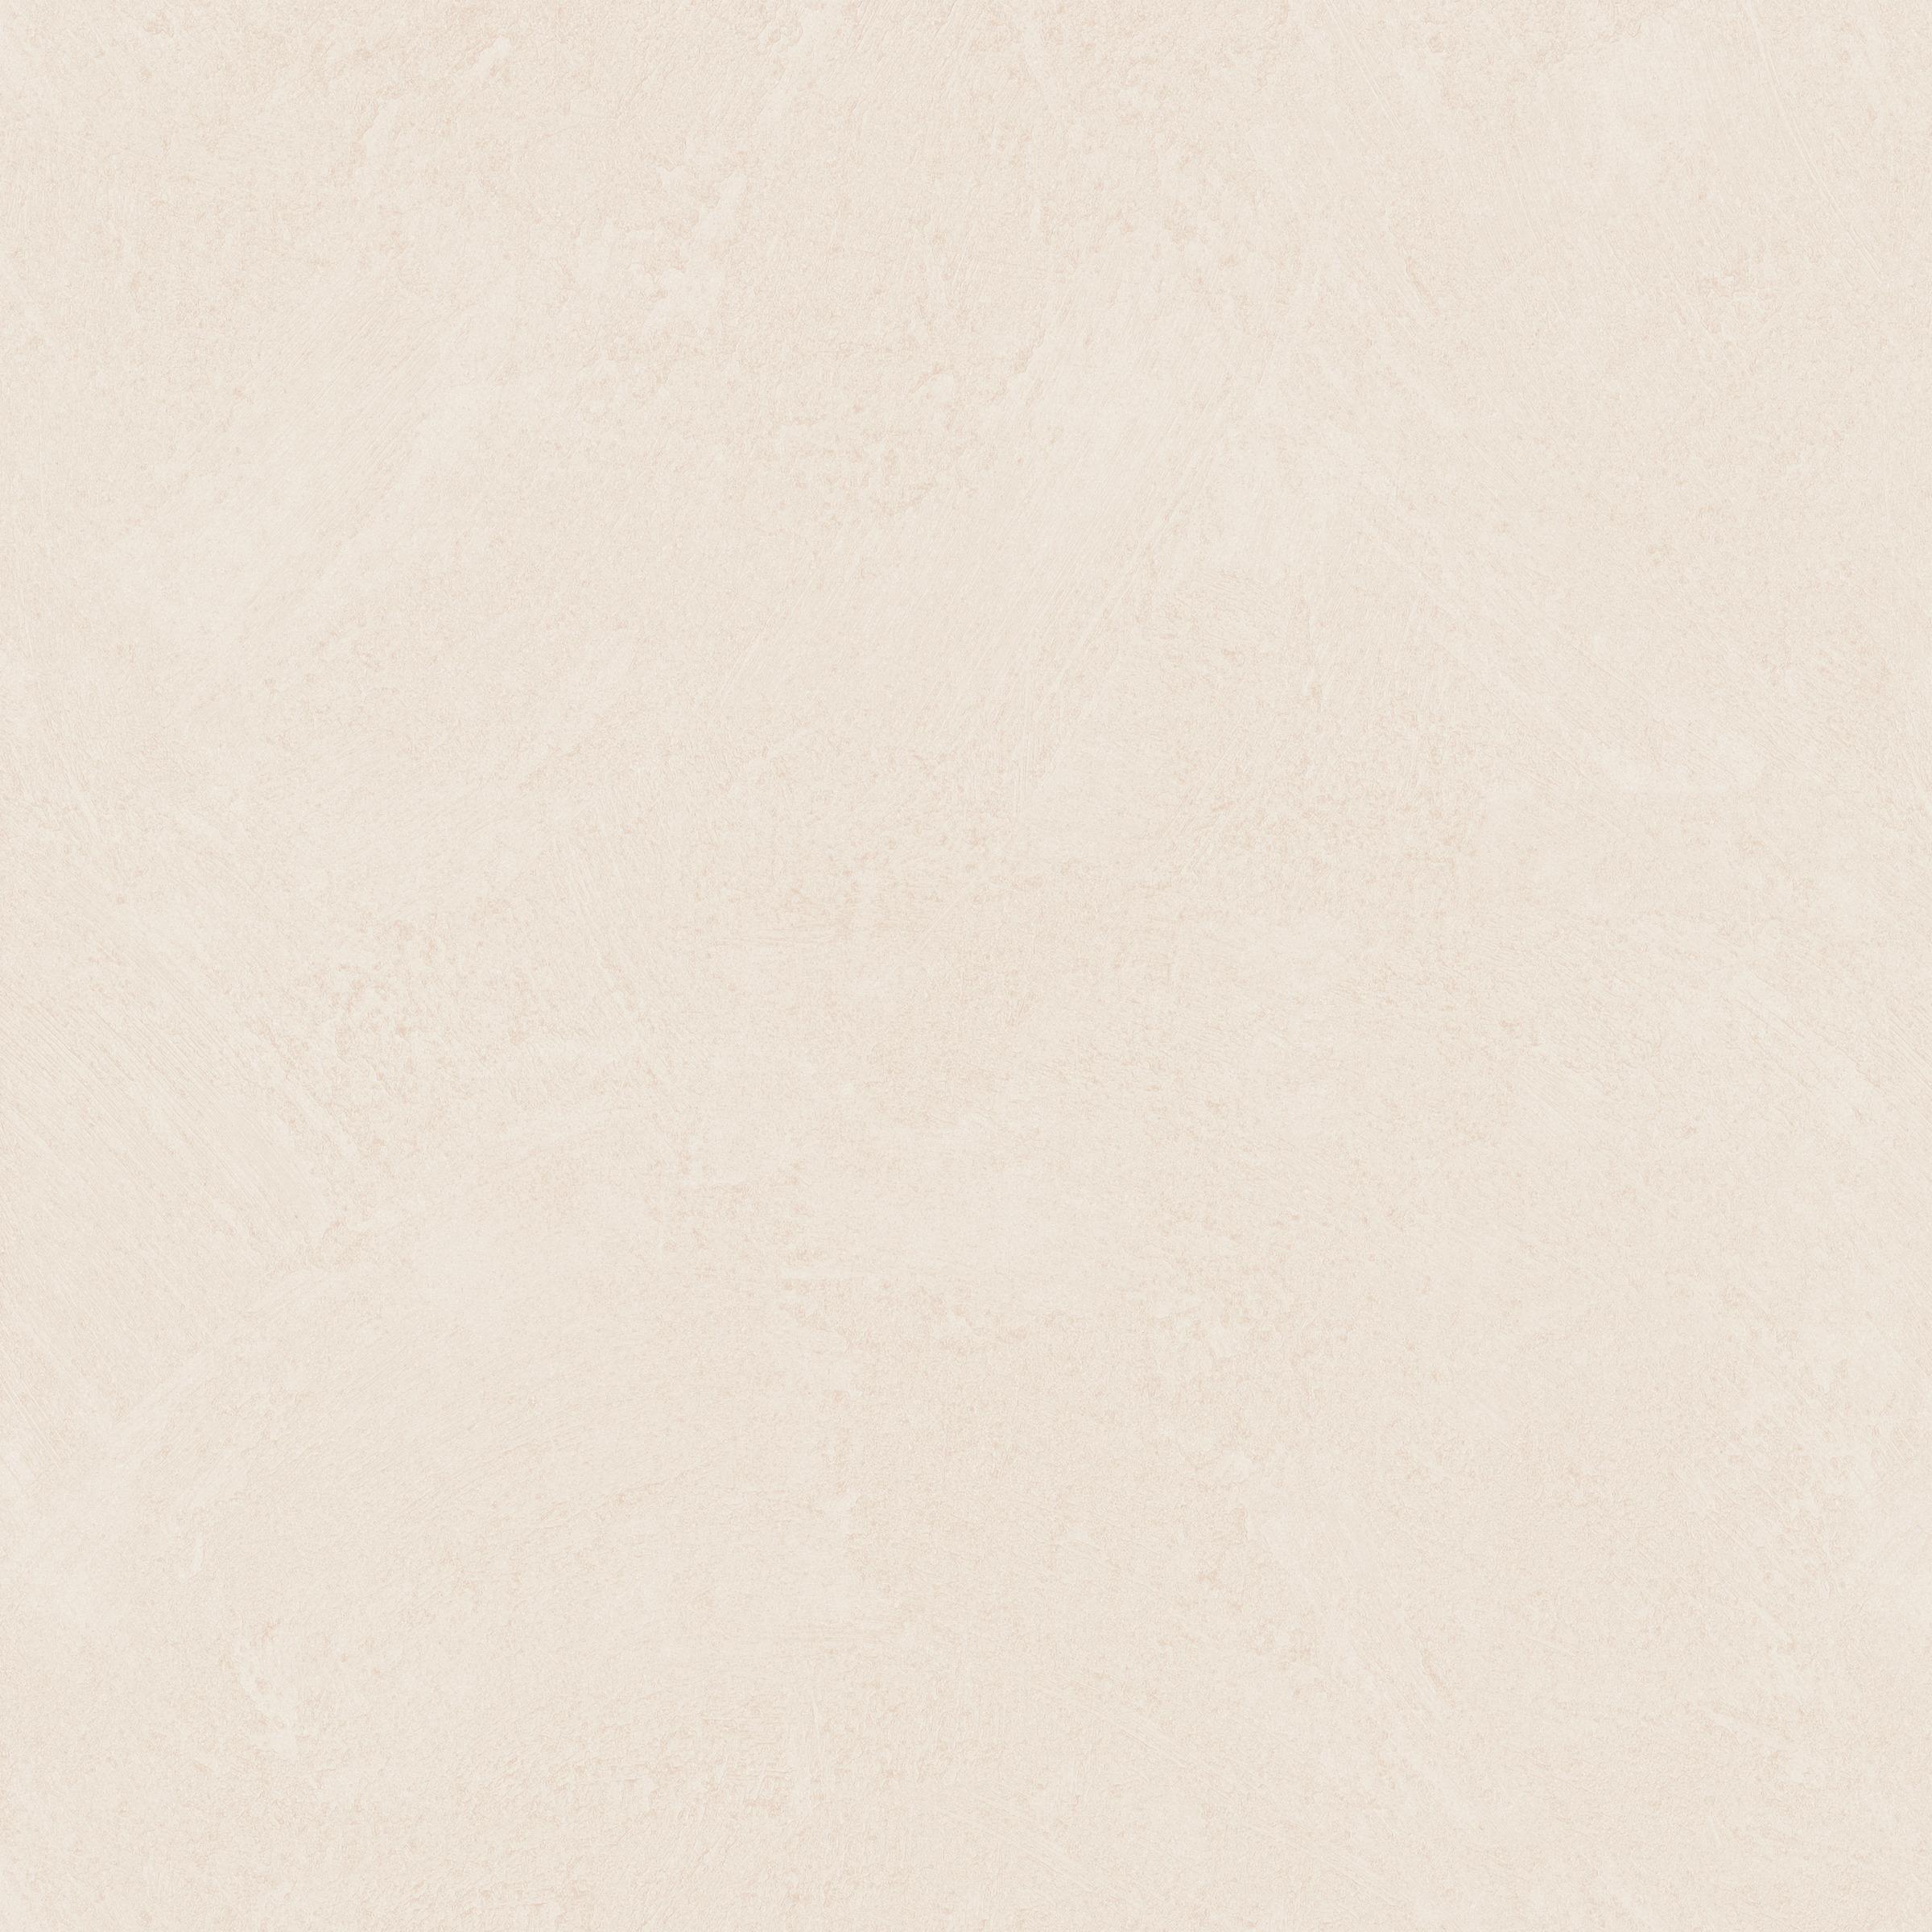 Superfresco Easy Behang Beton Beige 1,06mx10m